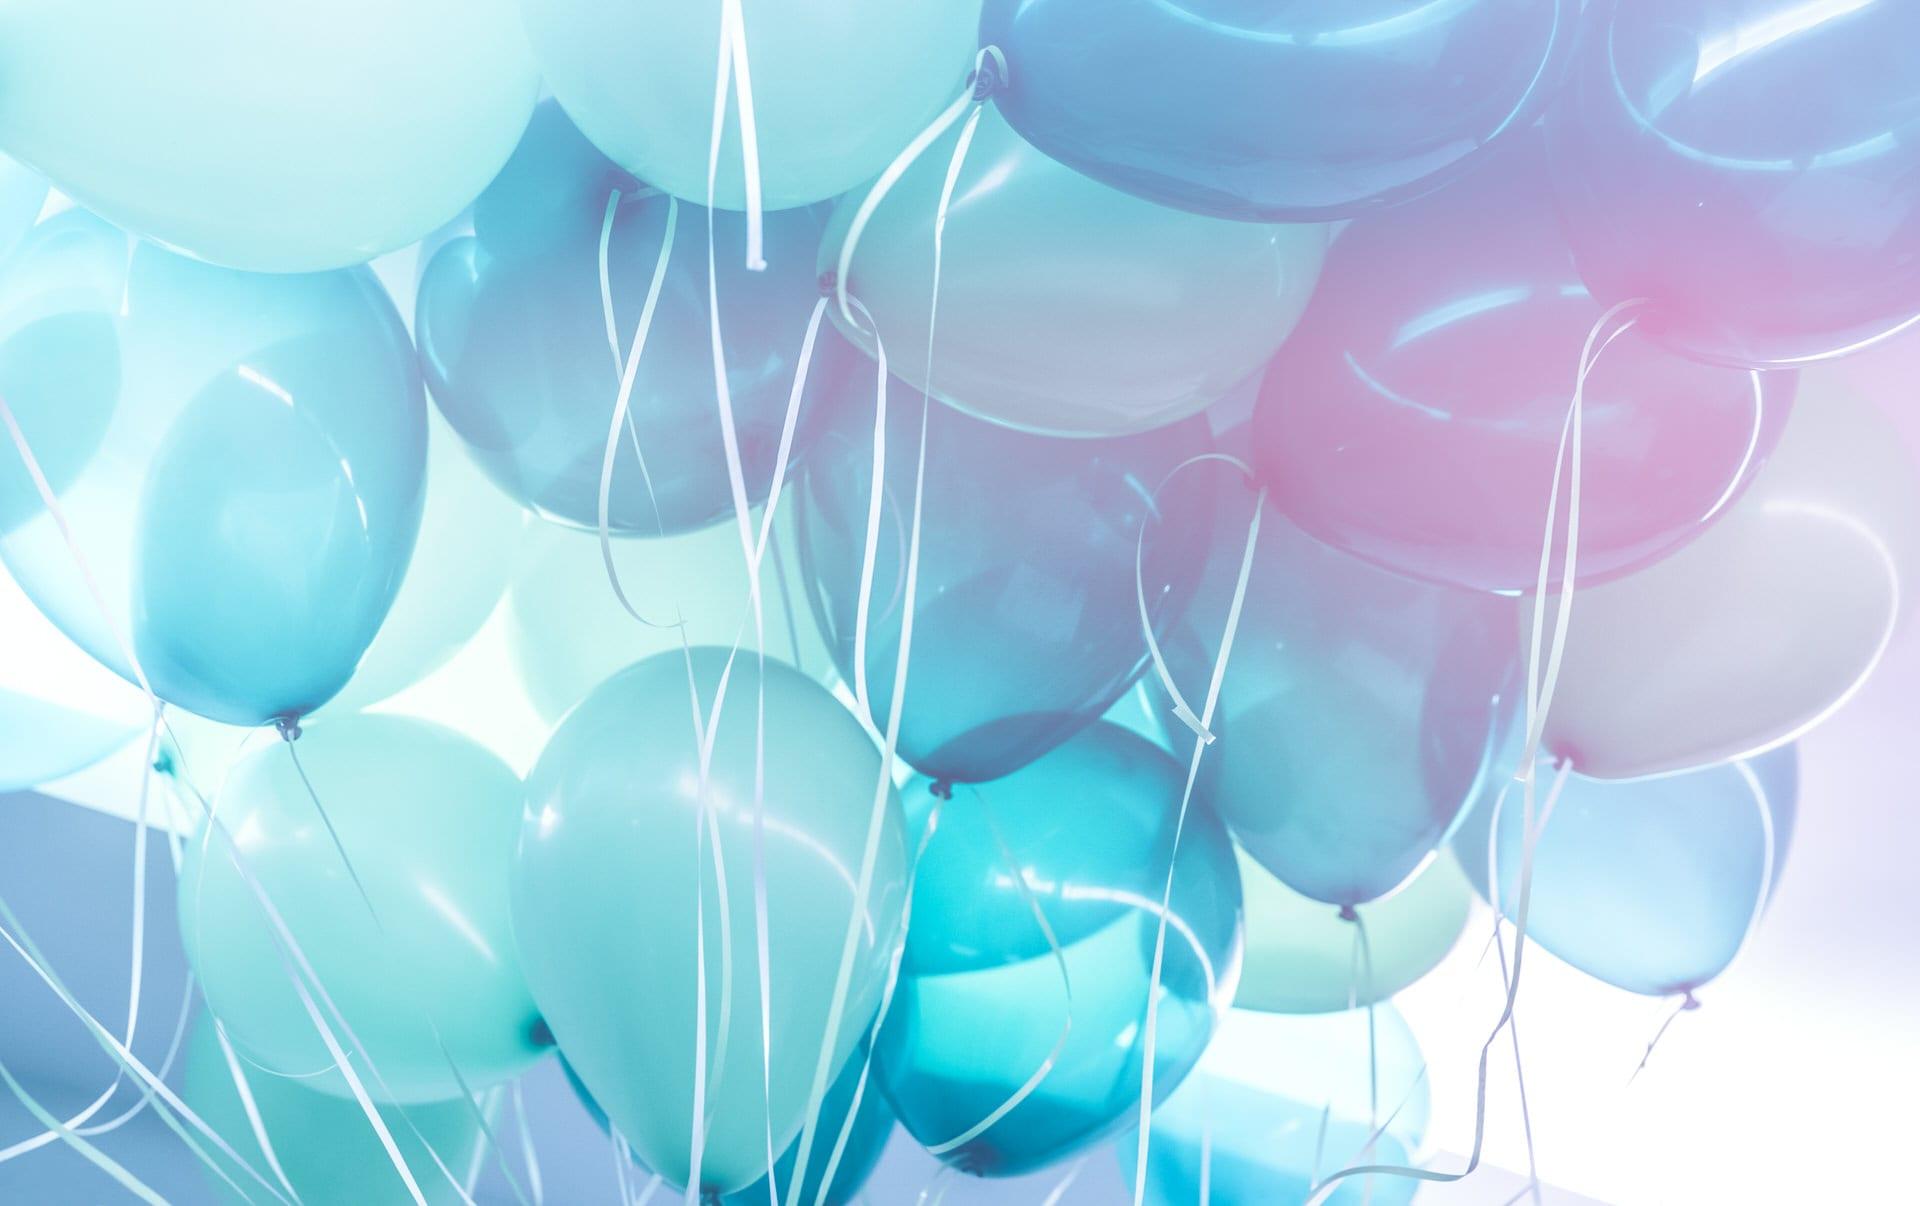 blue balloons background PWSSDST - RSVP